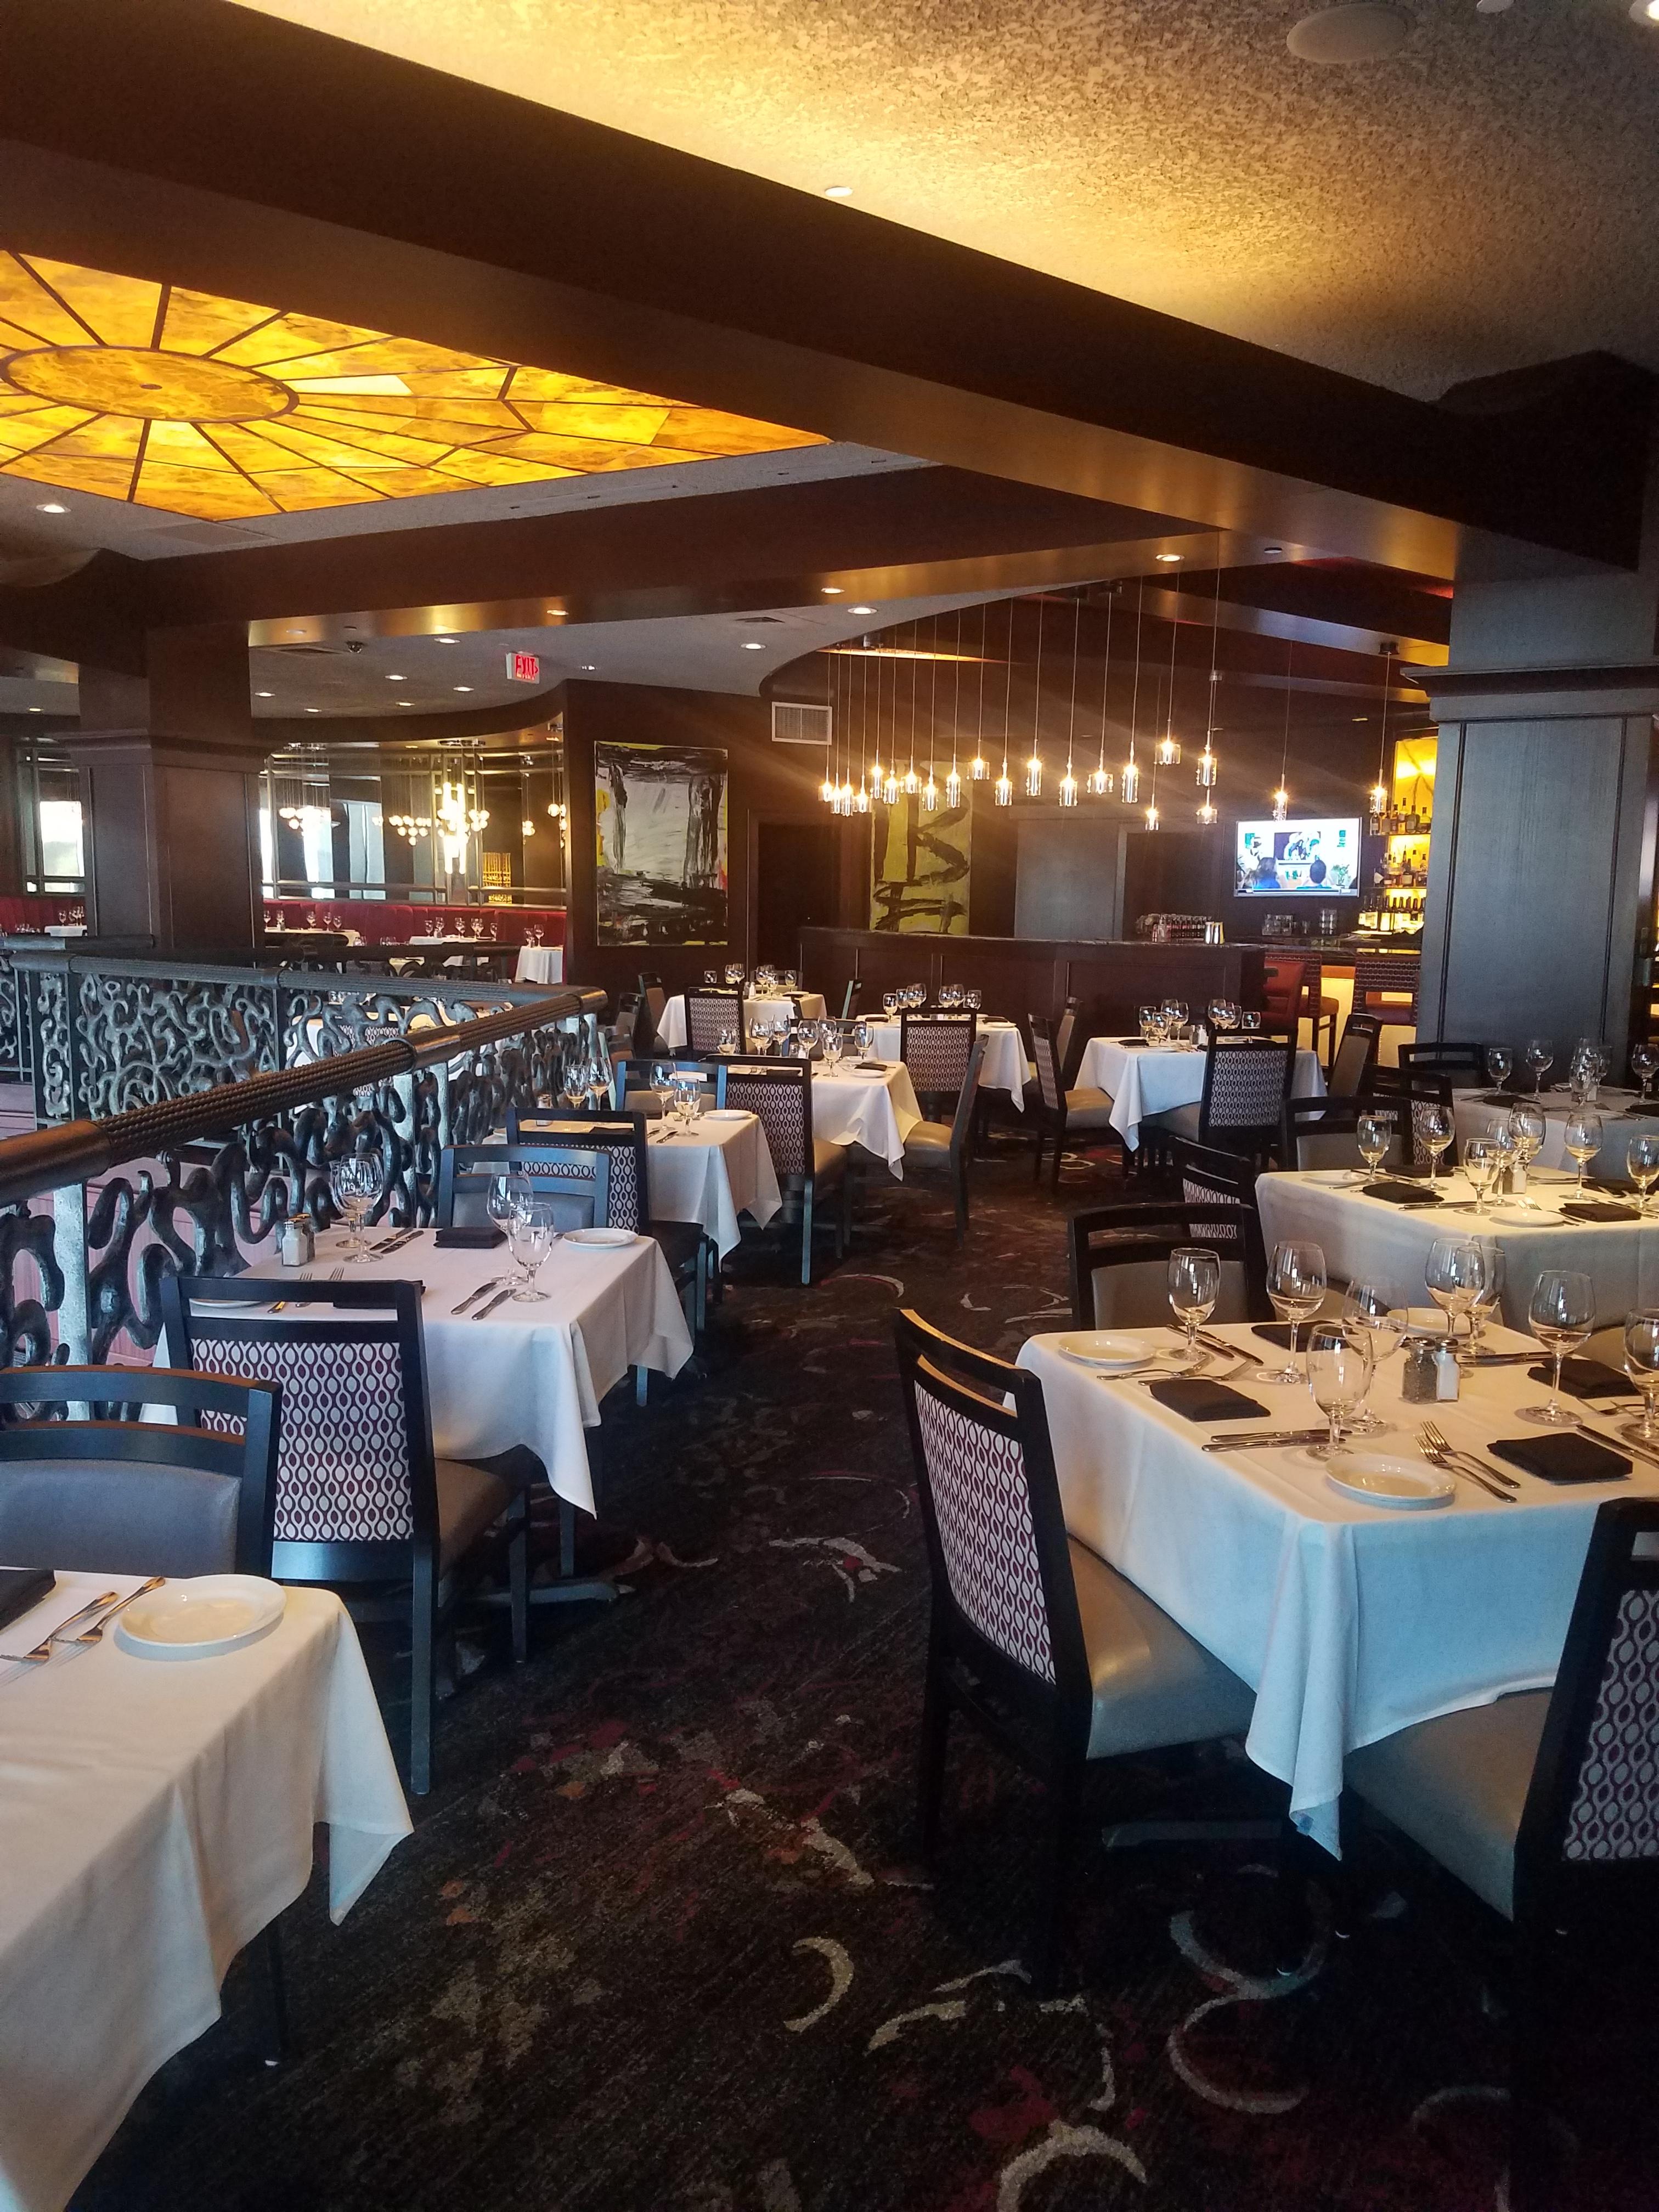 Del Frisco's Double Eagle Steakhouse Houston The Mezzanine private dining room